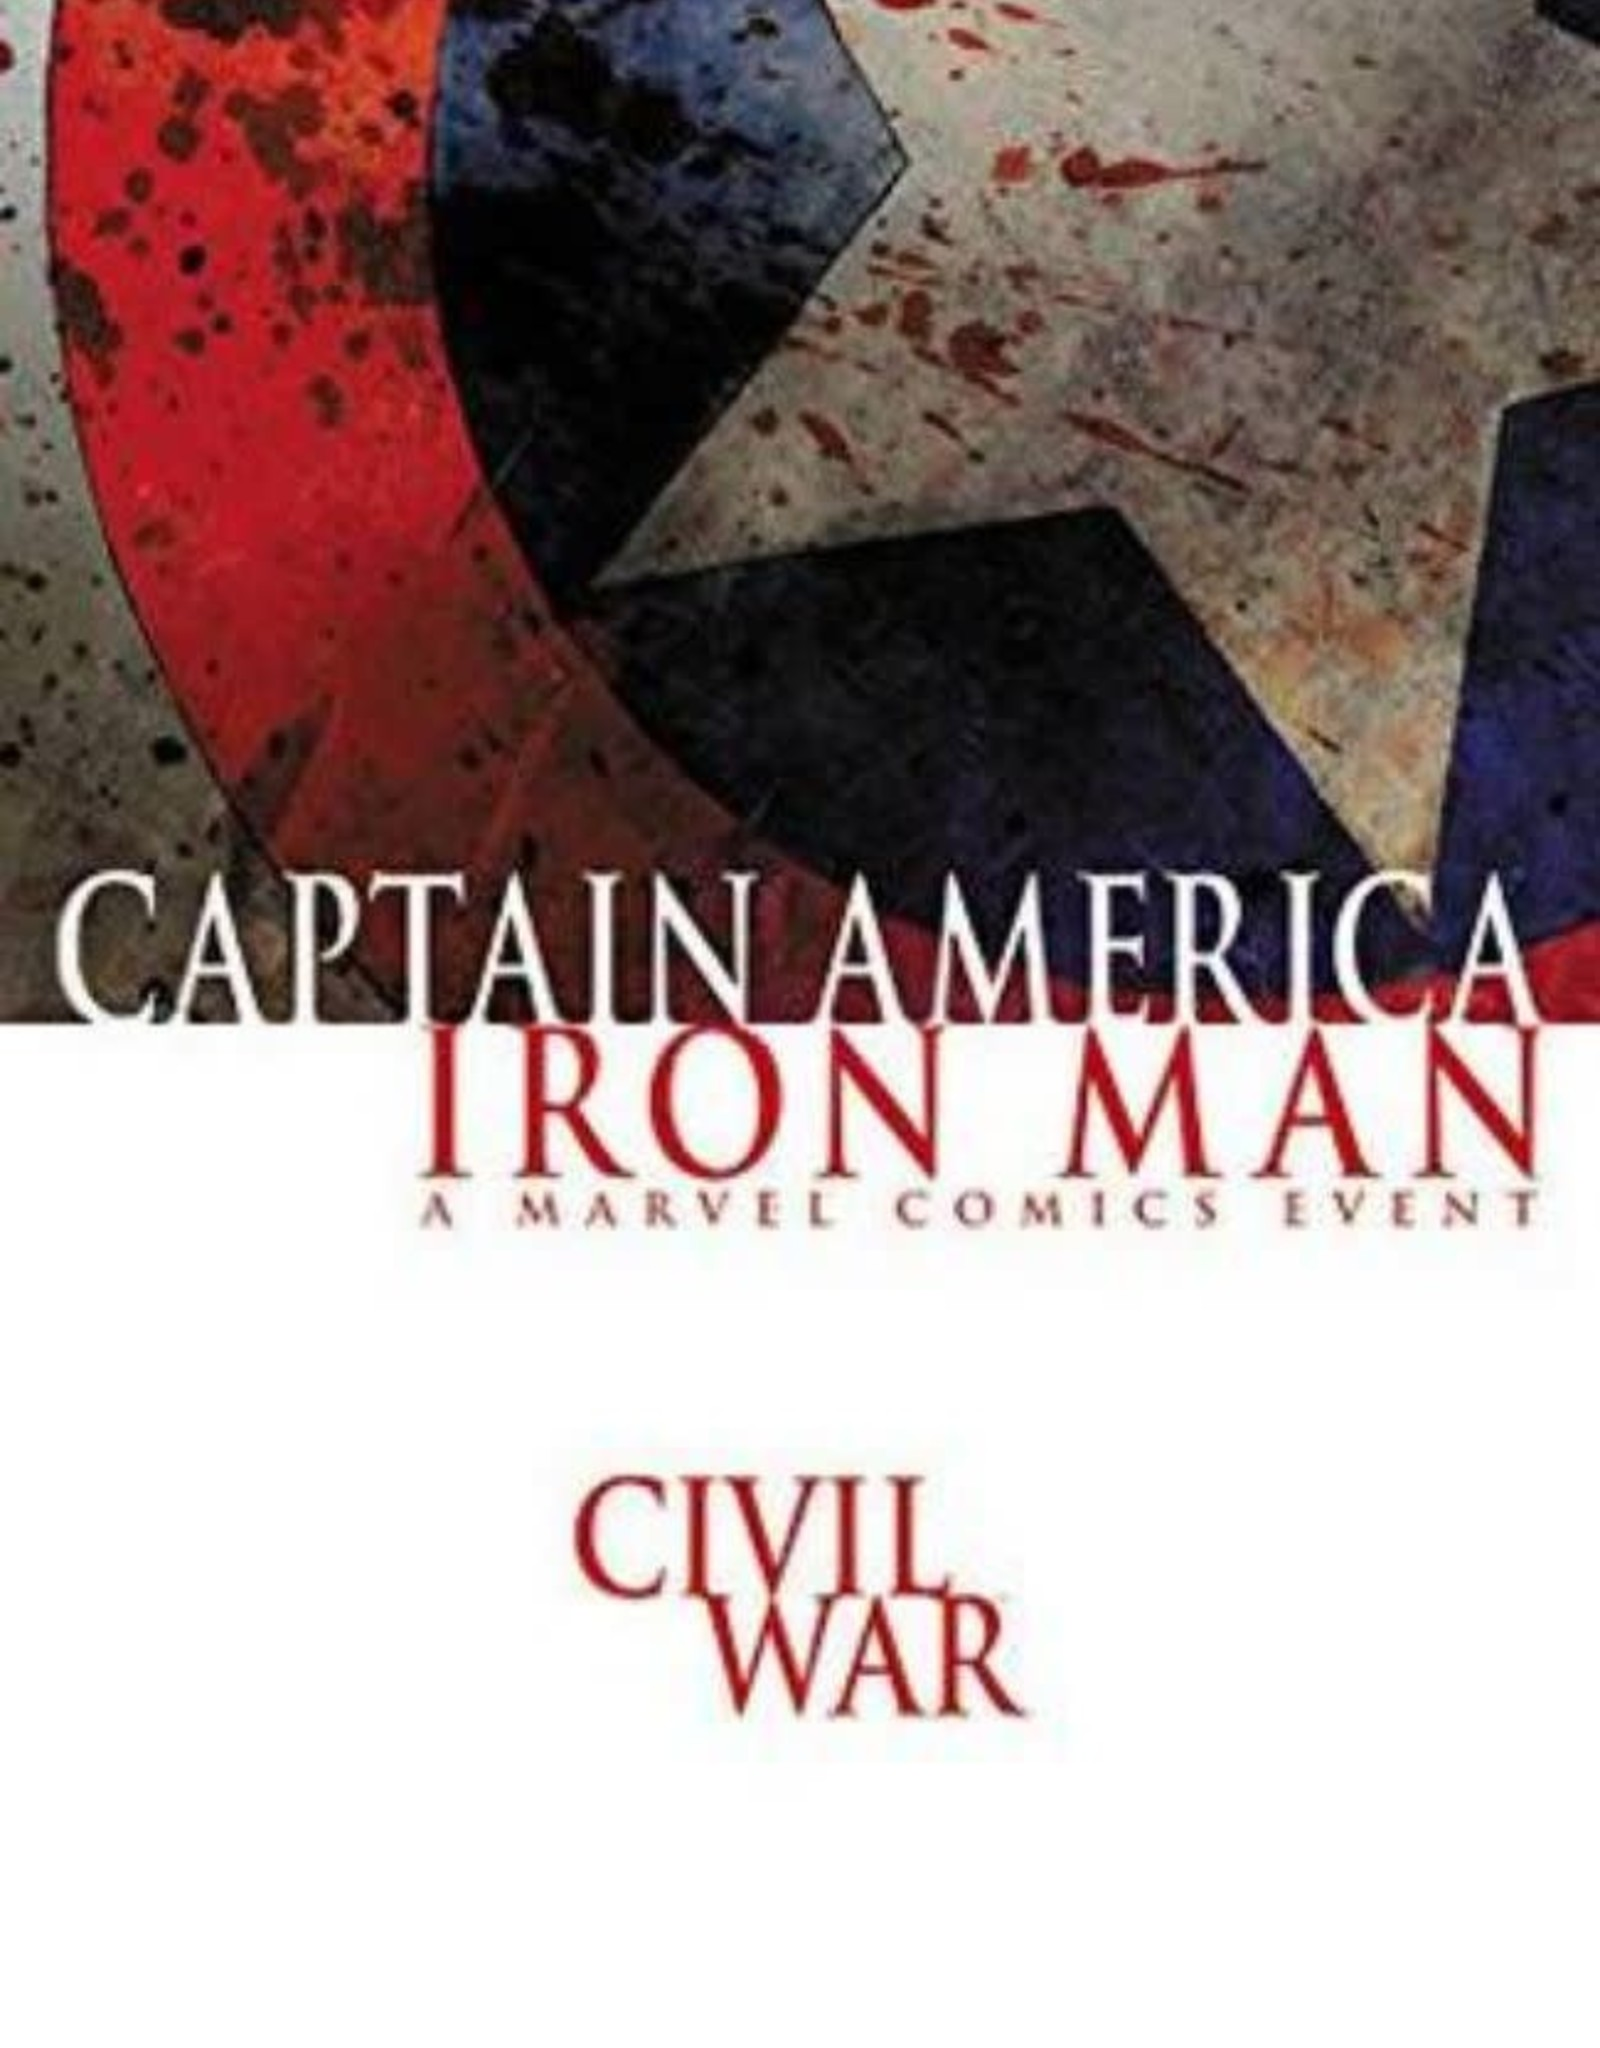 Marvel Comics Civil War Captain America/Iron Man